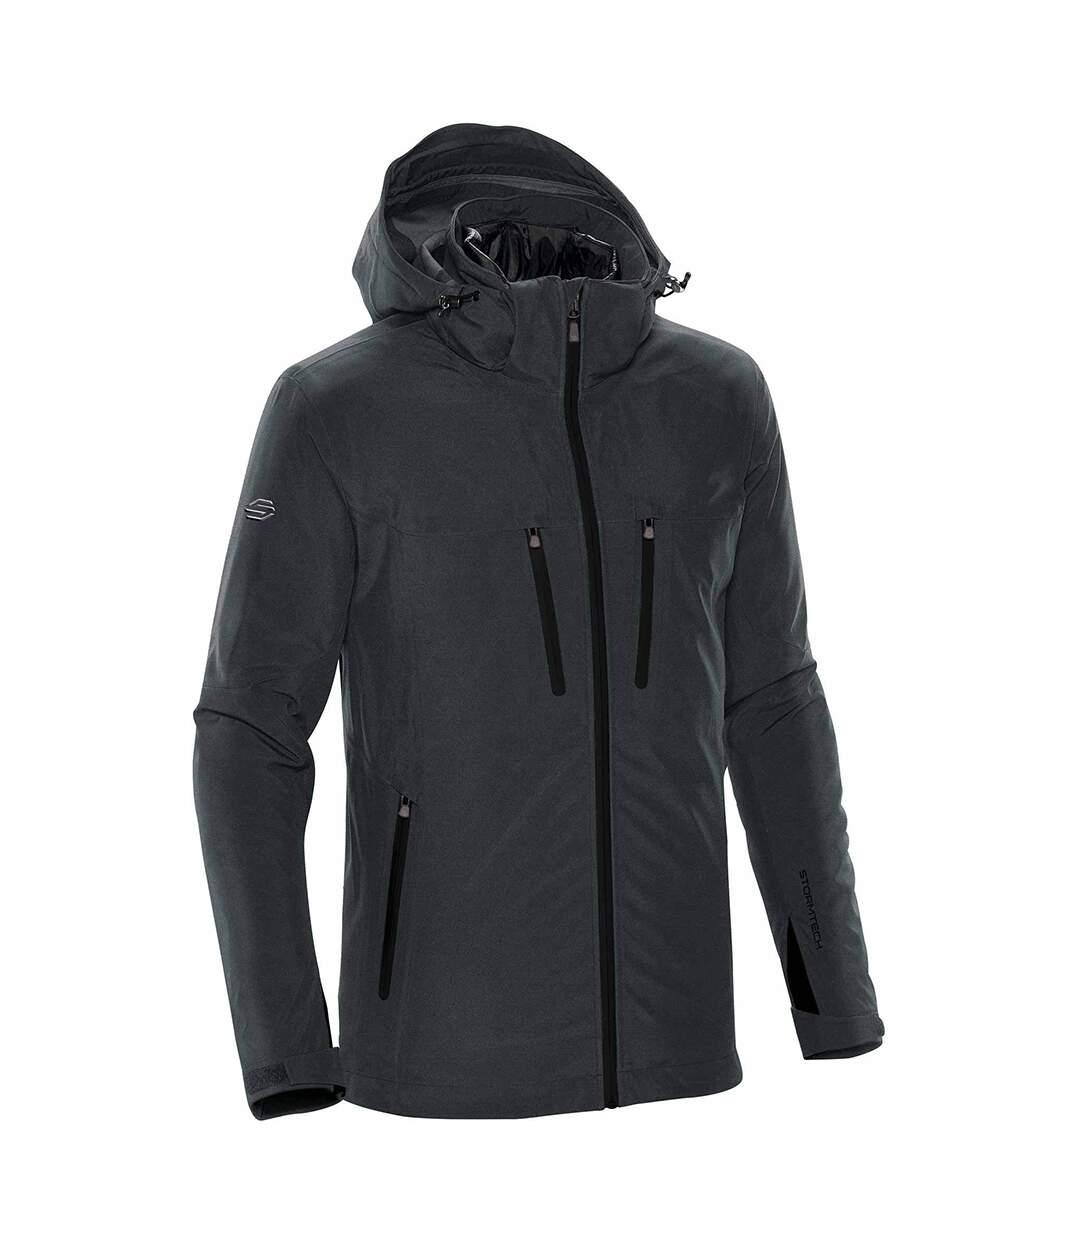 Stormtech Mens Matrix System Jacket (Black/Carbon) - UTBC4116